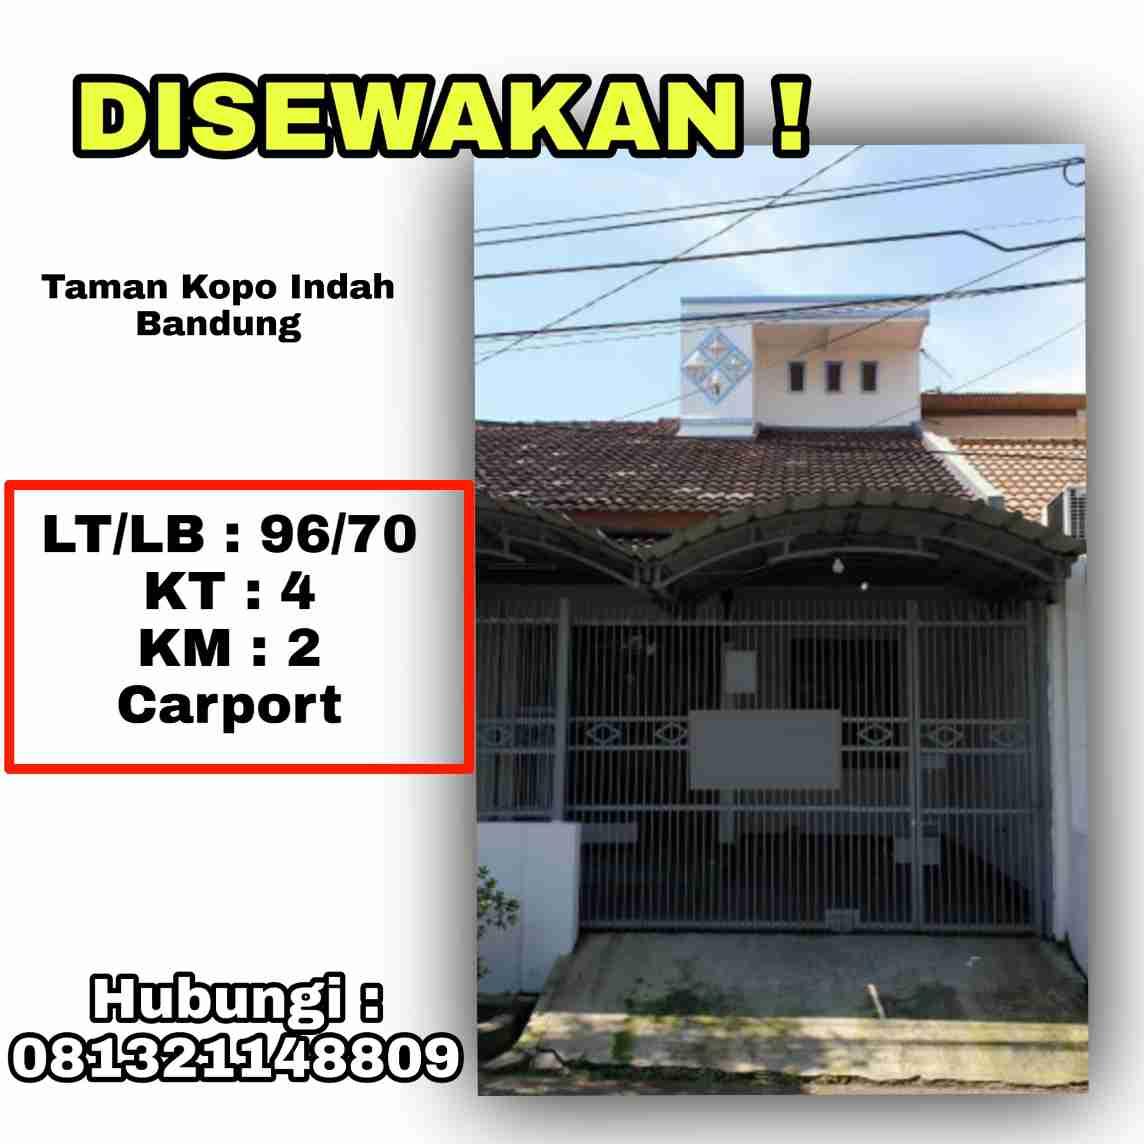 Disewakan Rumah Minimalis Taman Kopo Bandung